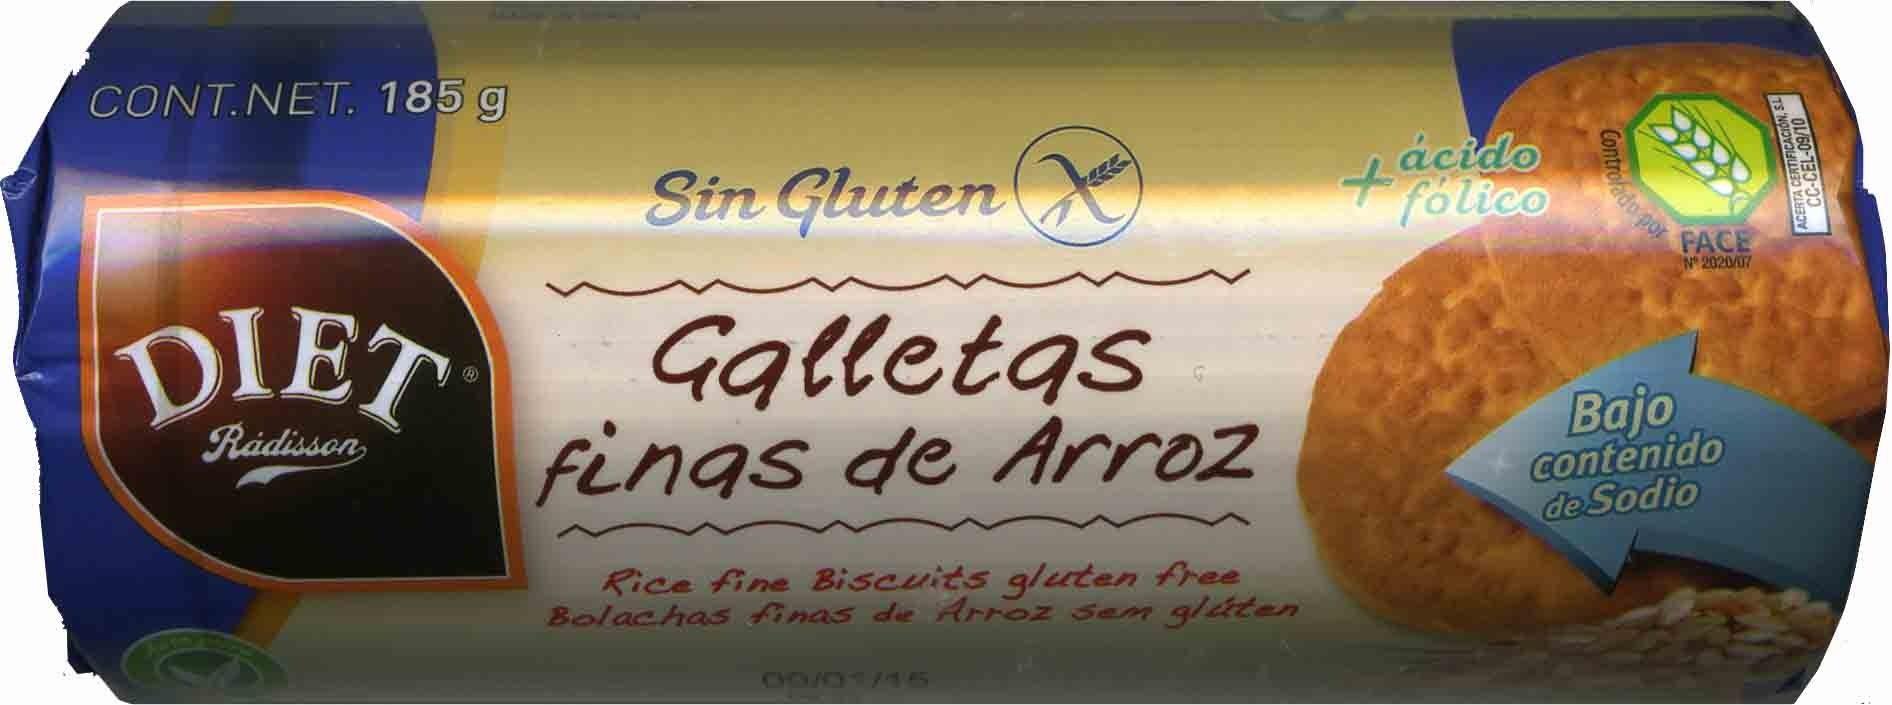 Galletas finas de arroz sin gluten - Produit - fr